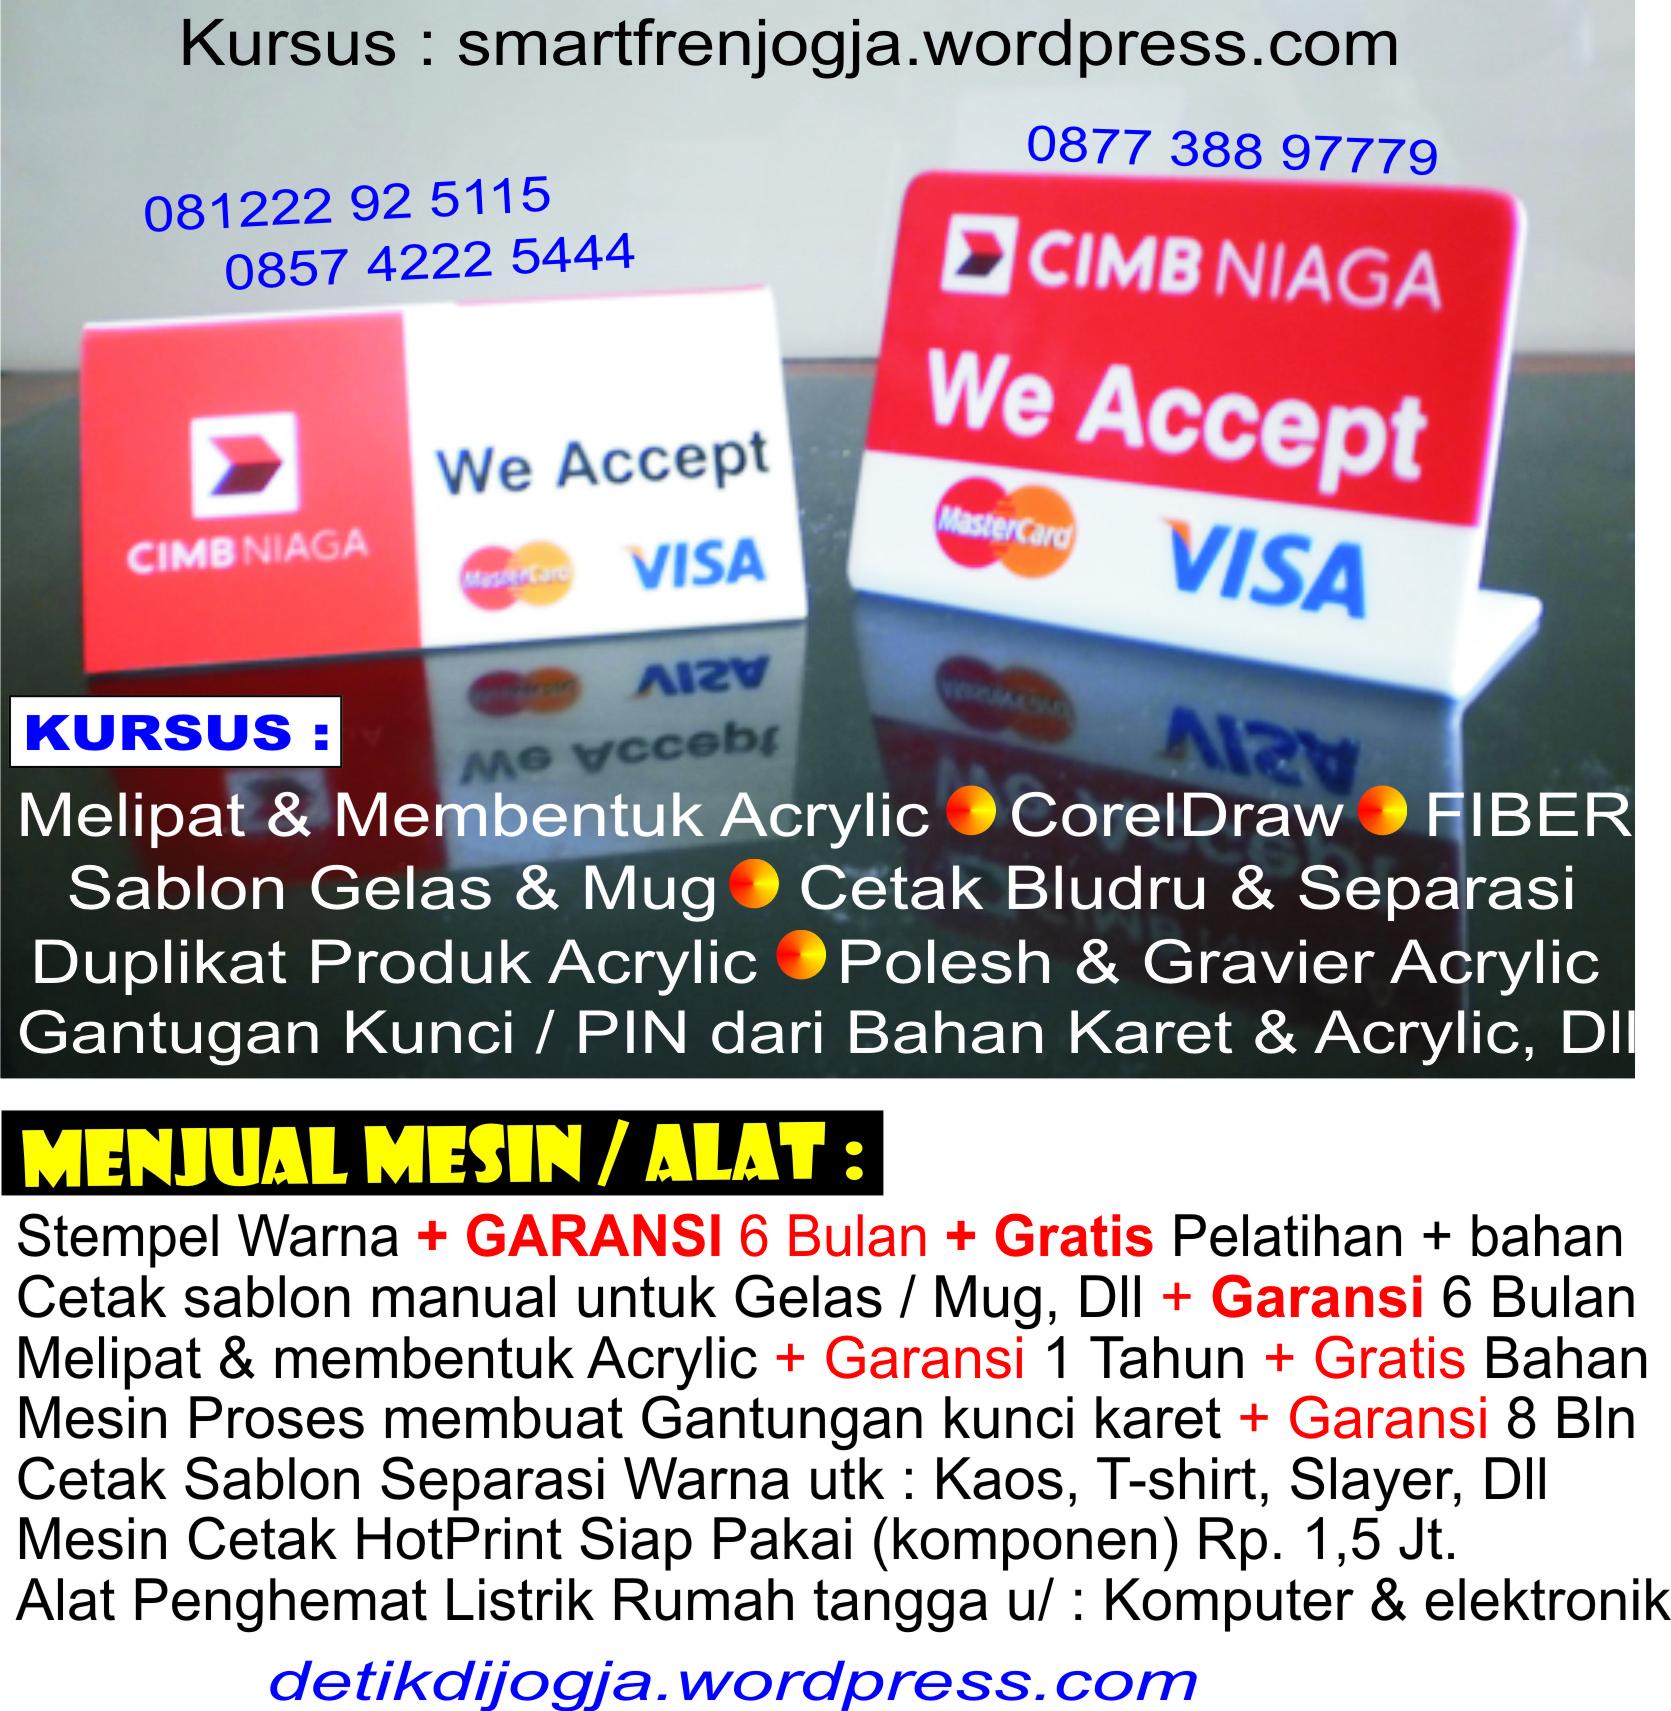 Lowongan Pns Guru Depok 2013 Tempos News Kami Spesial Website Pusat Kursus Cetak Offset Jilid Binding